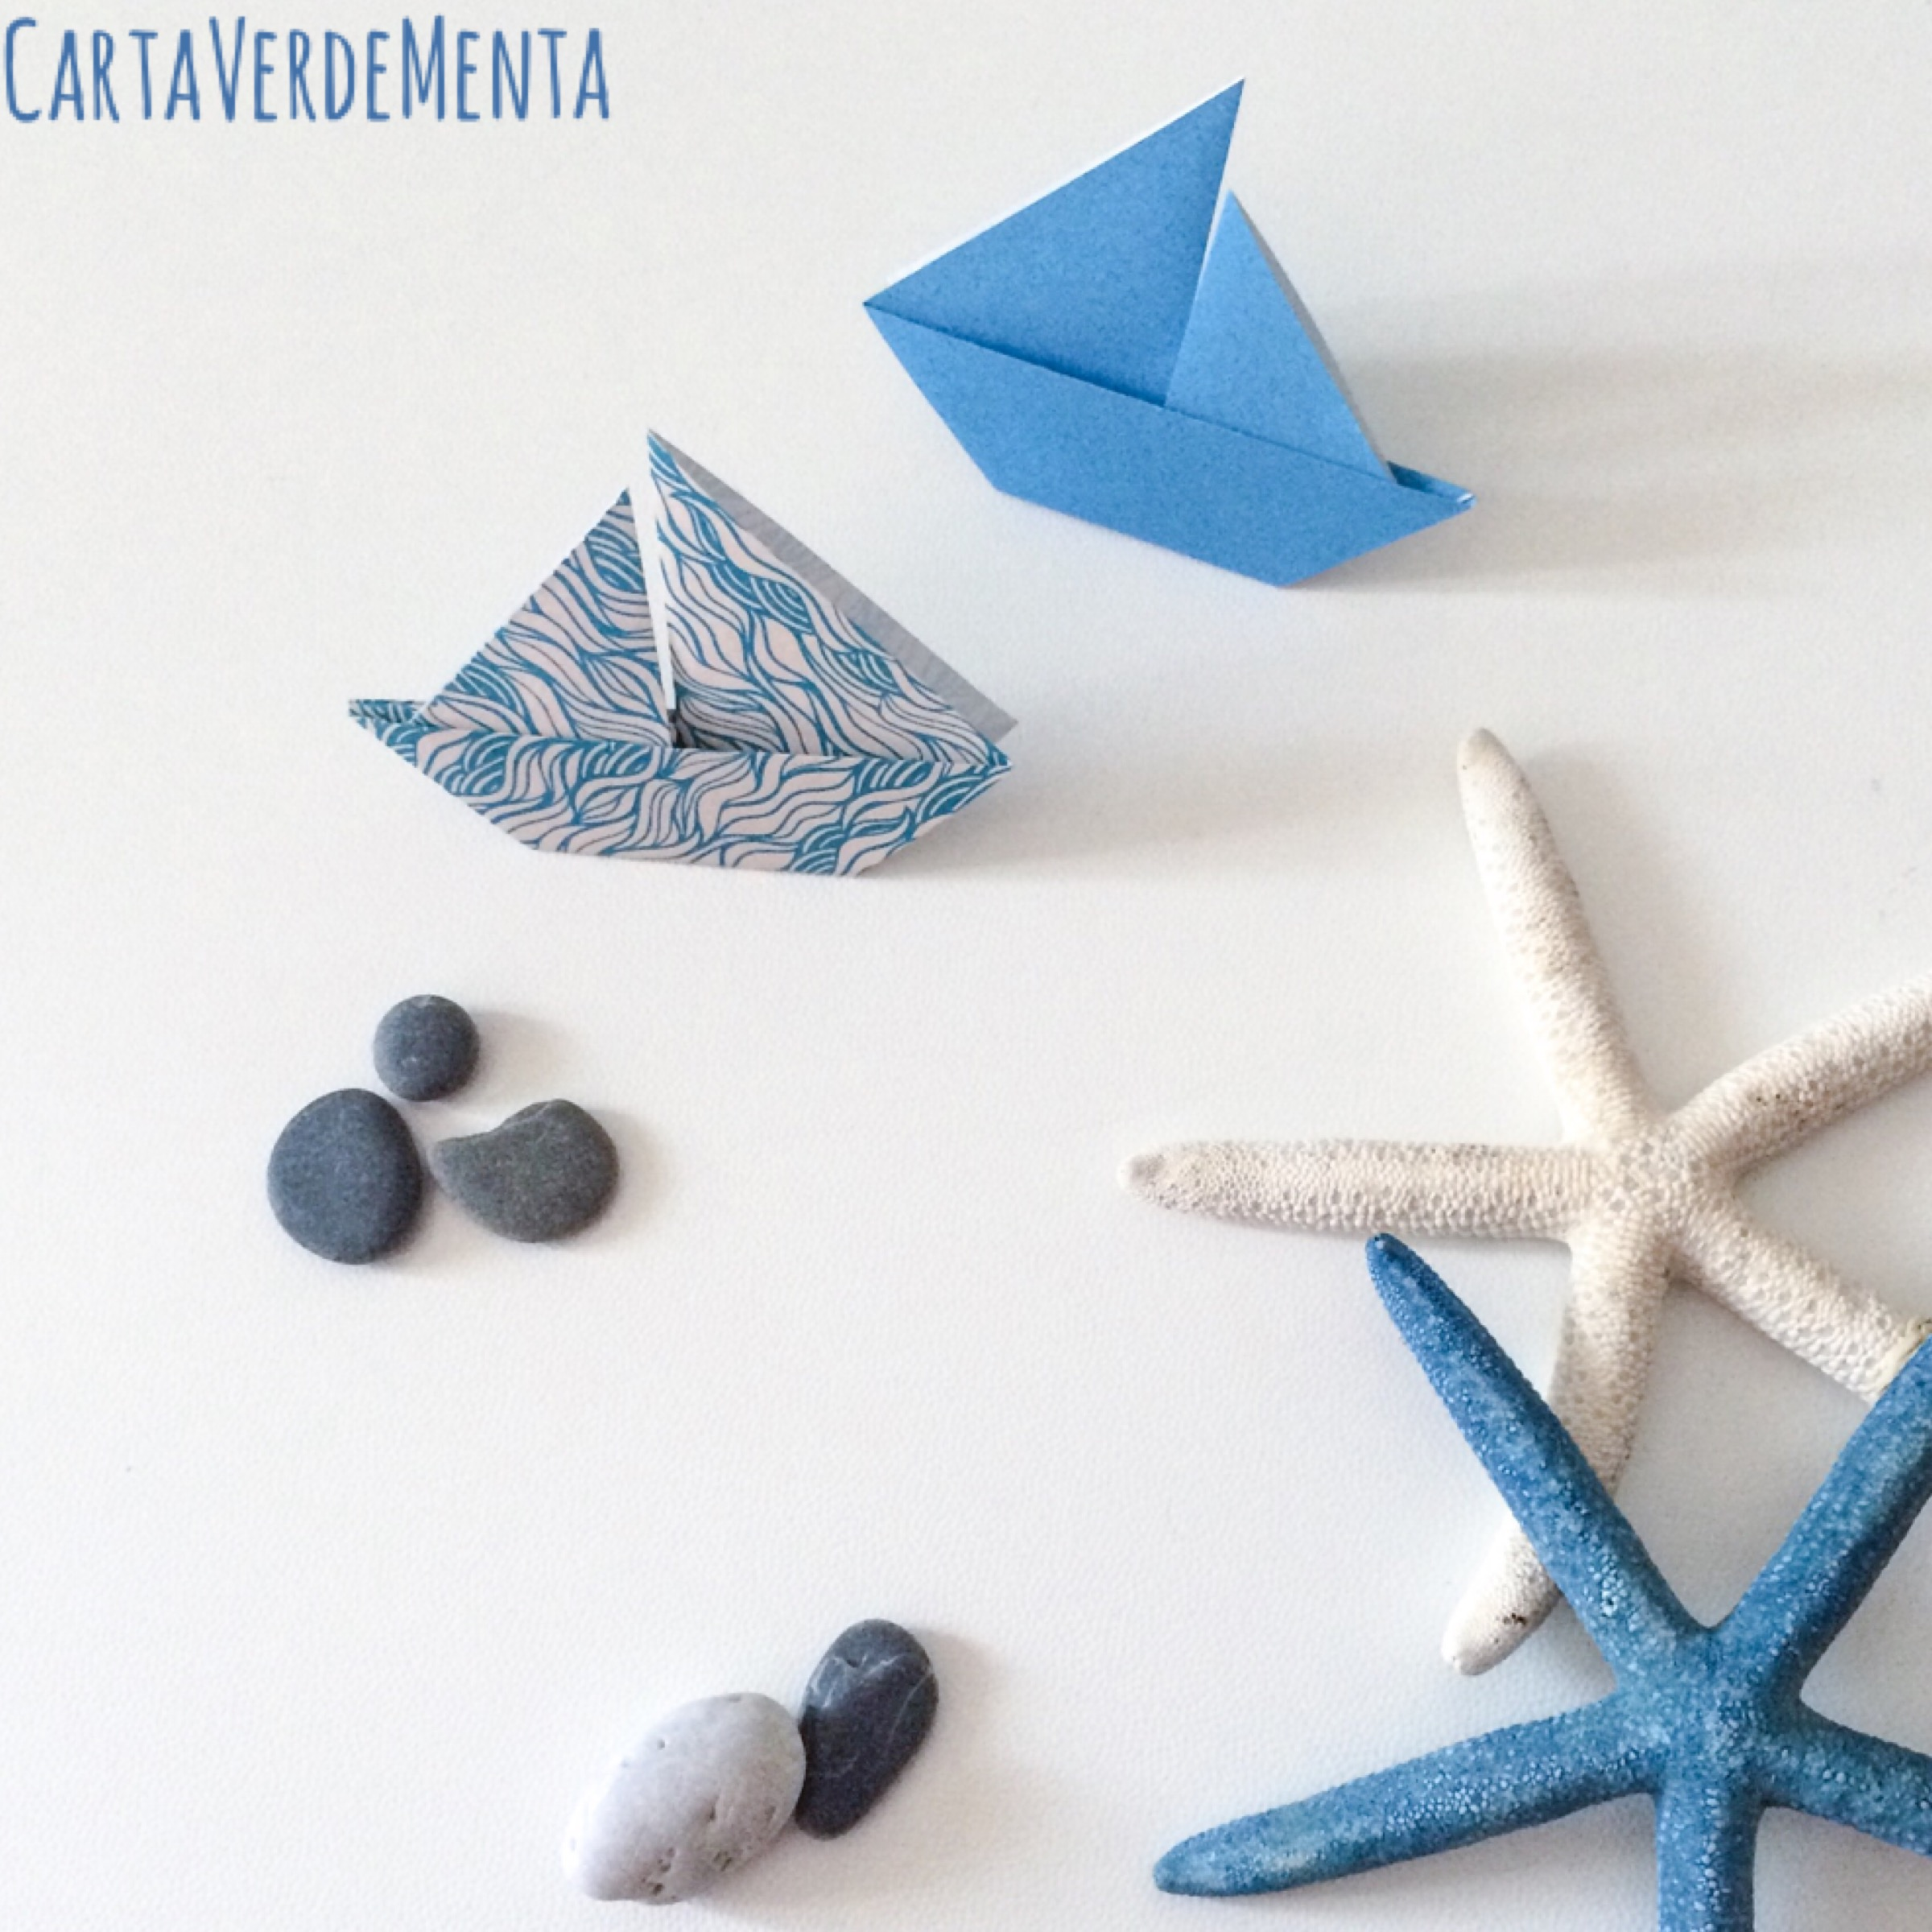 Barchetta Origami E Pomi Pugliesi Carta Verde Menta